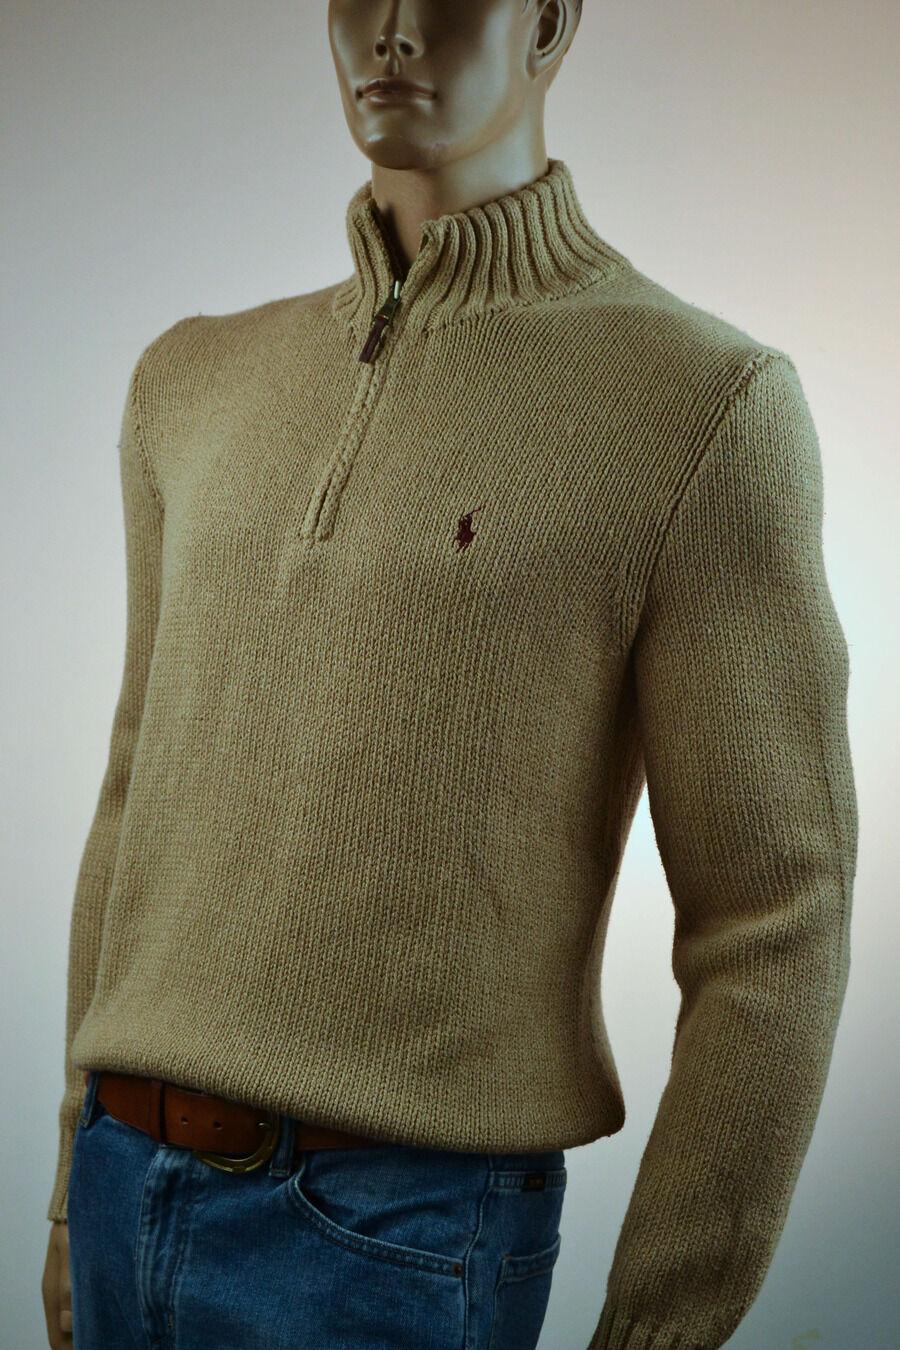 Ralph Lauren High-Twist Cotton New Camel Half-Zip Sweater Burgundy Pony -NWT